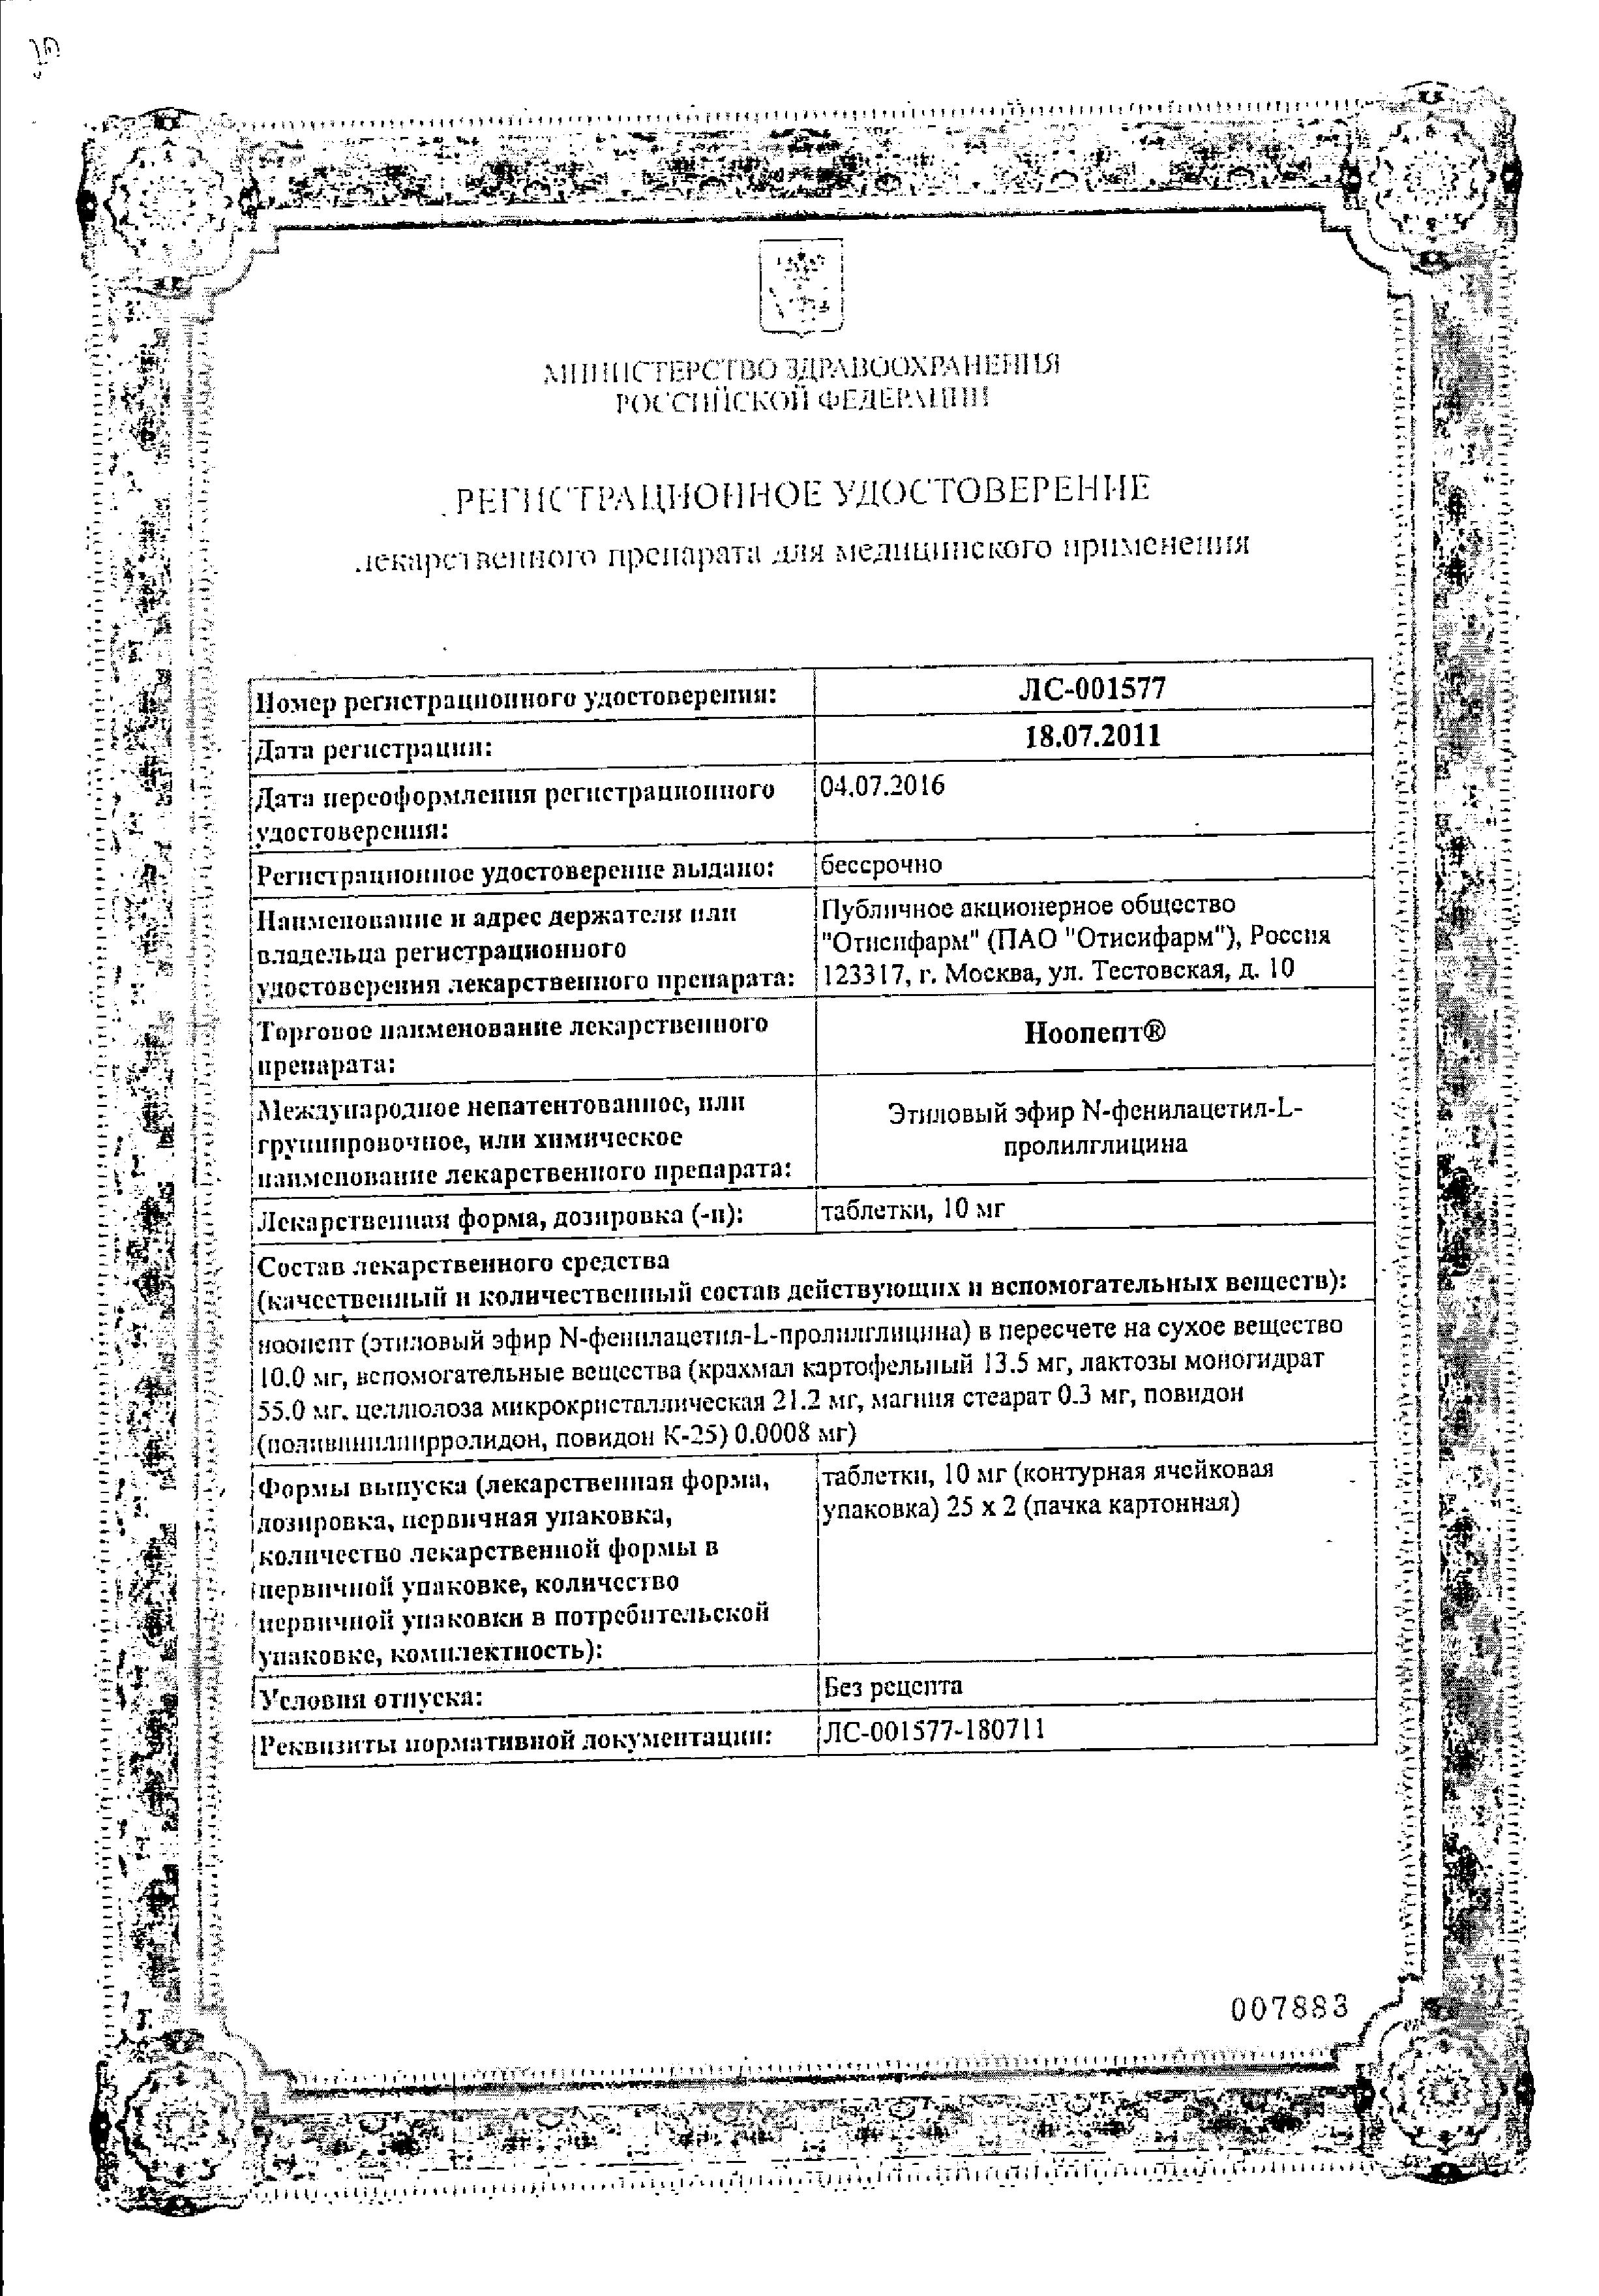 Ноопепт сертификат